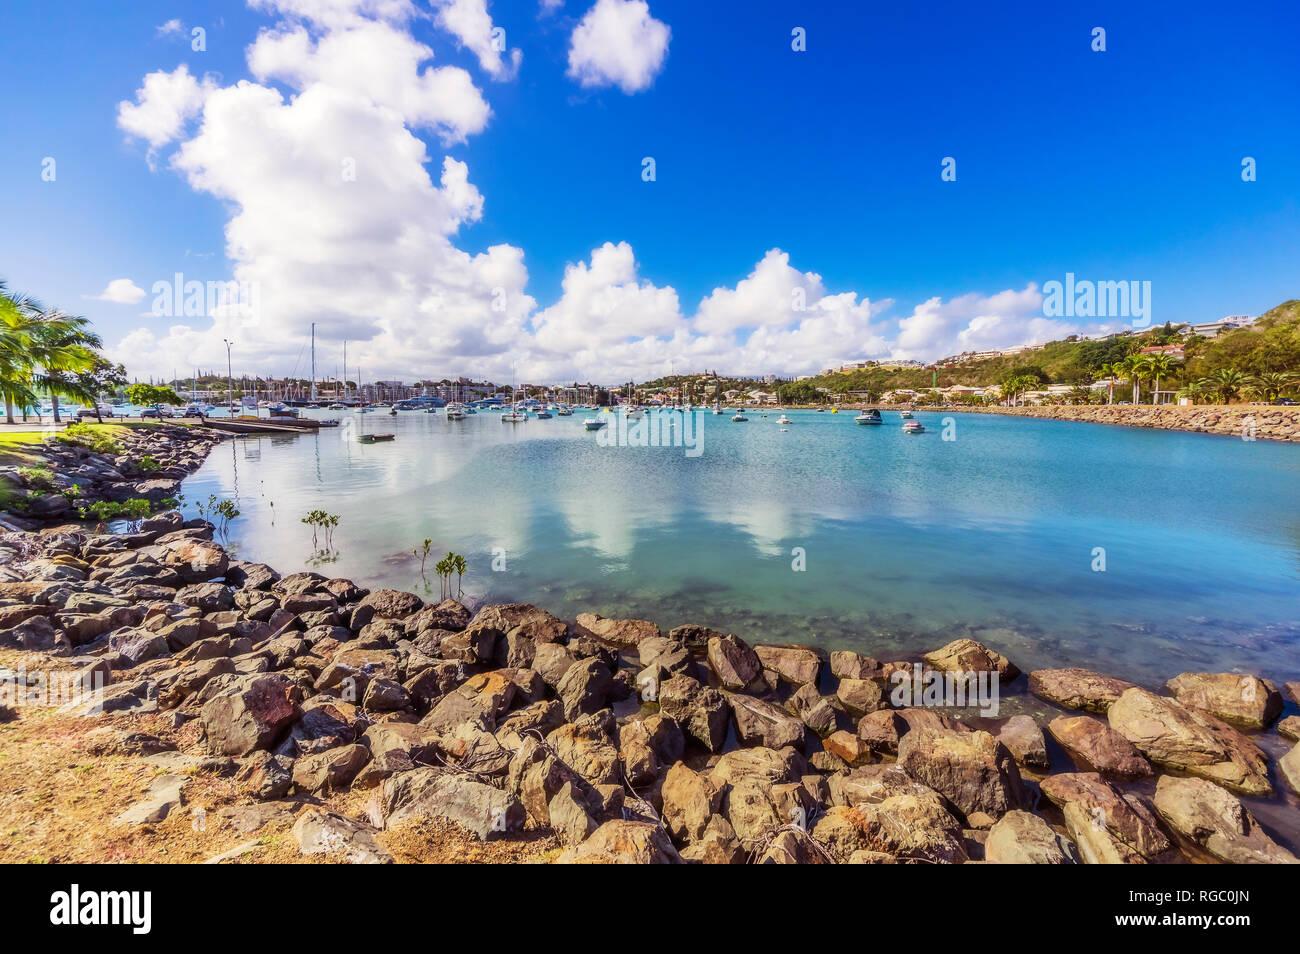 New Caledonia, Noumea, harbour - Stock Image